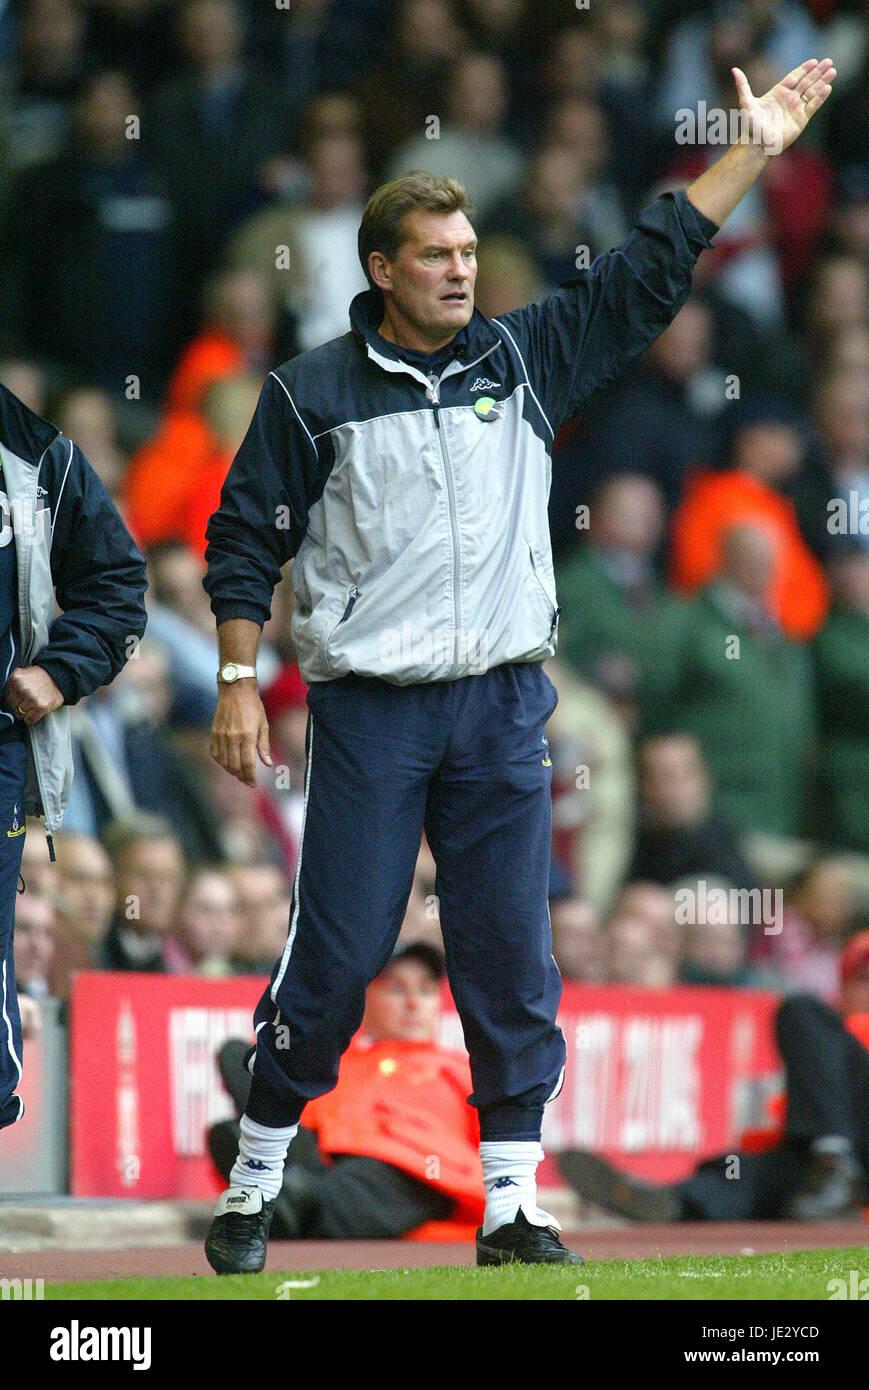 Glenn Hoddle Tottenham Hotspur Fc Manager Anfield Liverpool England Stock Photo Alamy